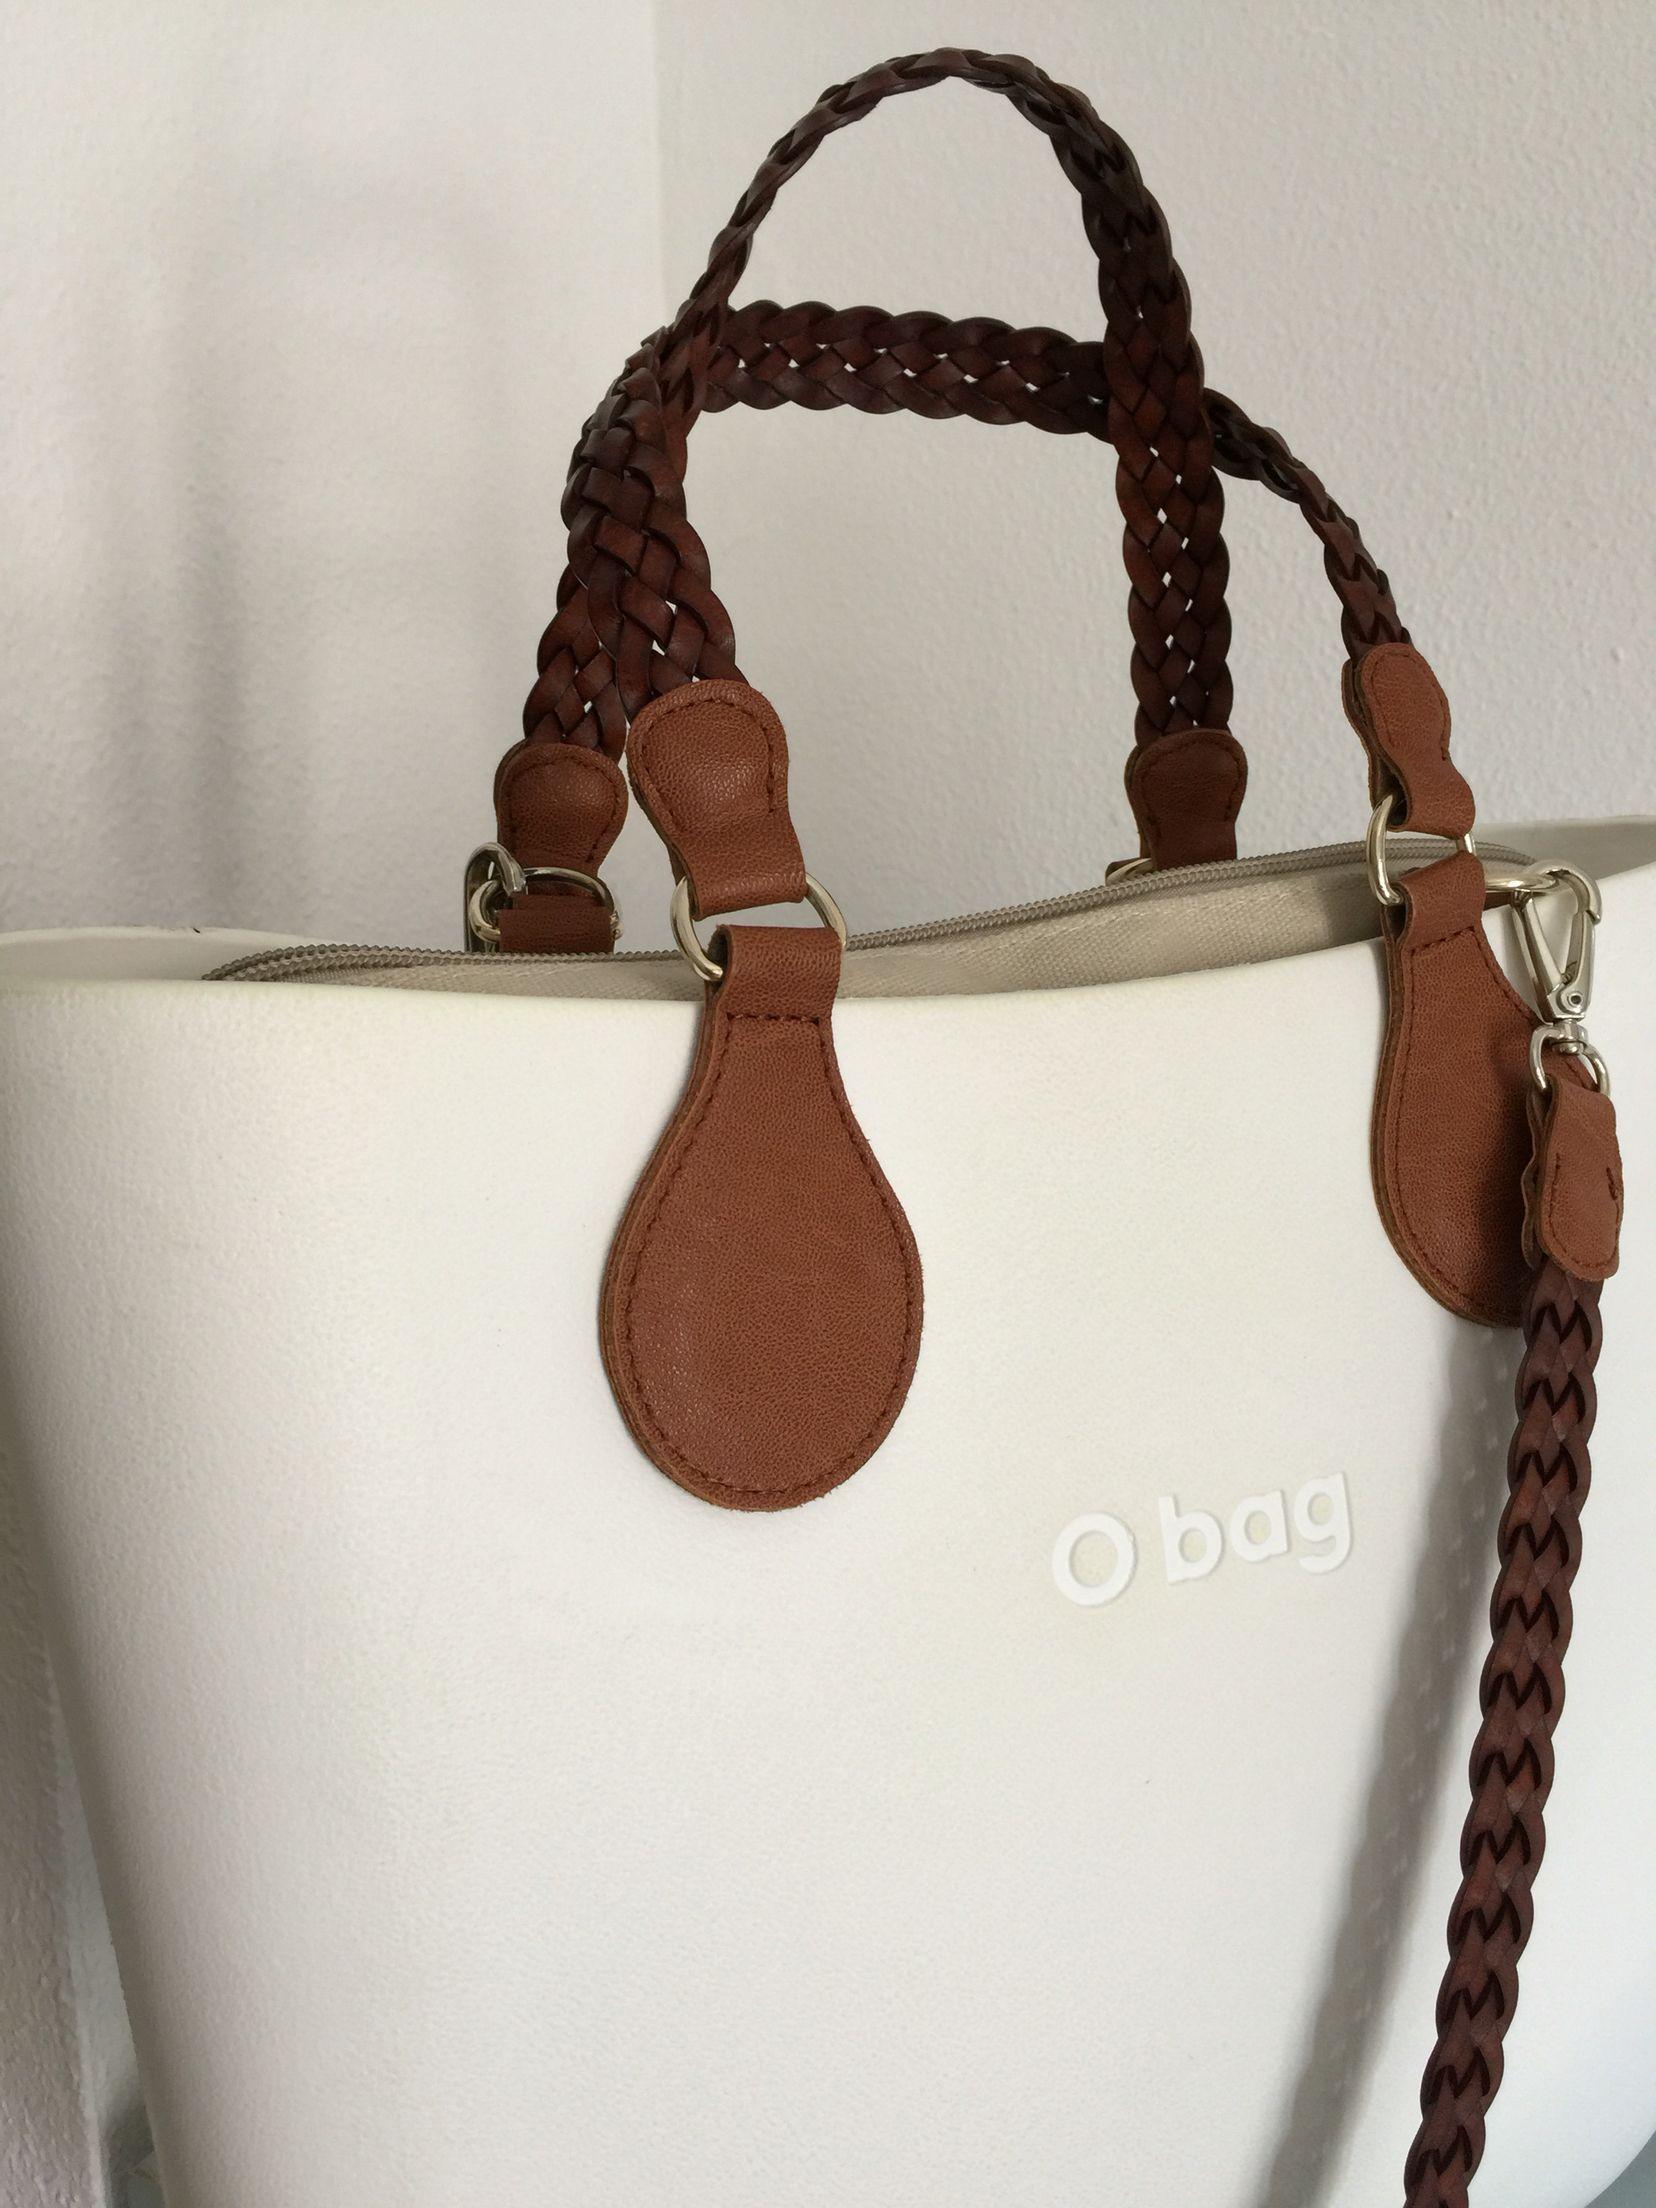 Kipling Bags, Laser, Fashion Shops, Baggage, Canon, Pandora, Clock,  Clothing Accessories, Tote Bags